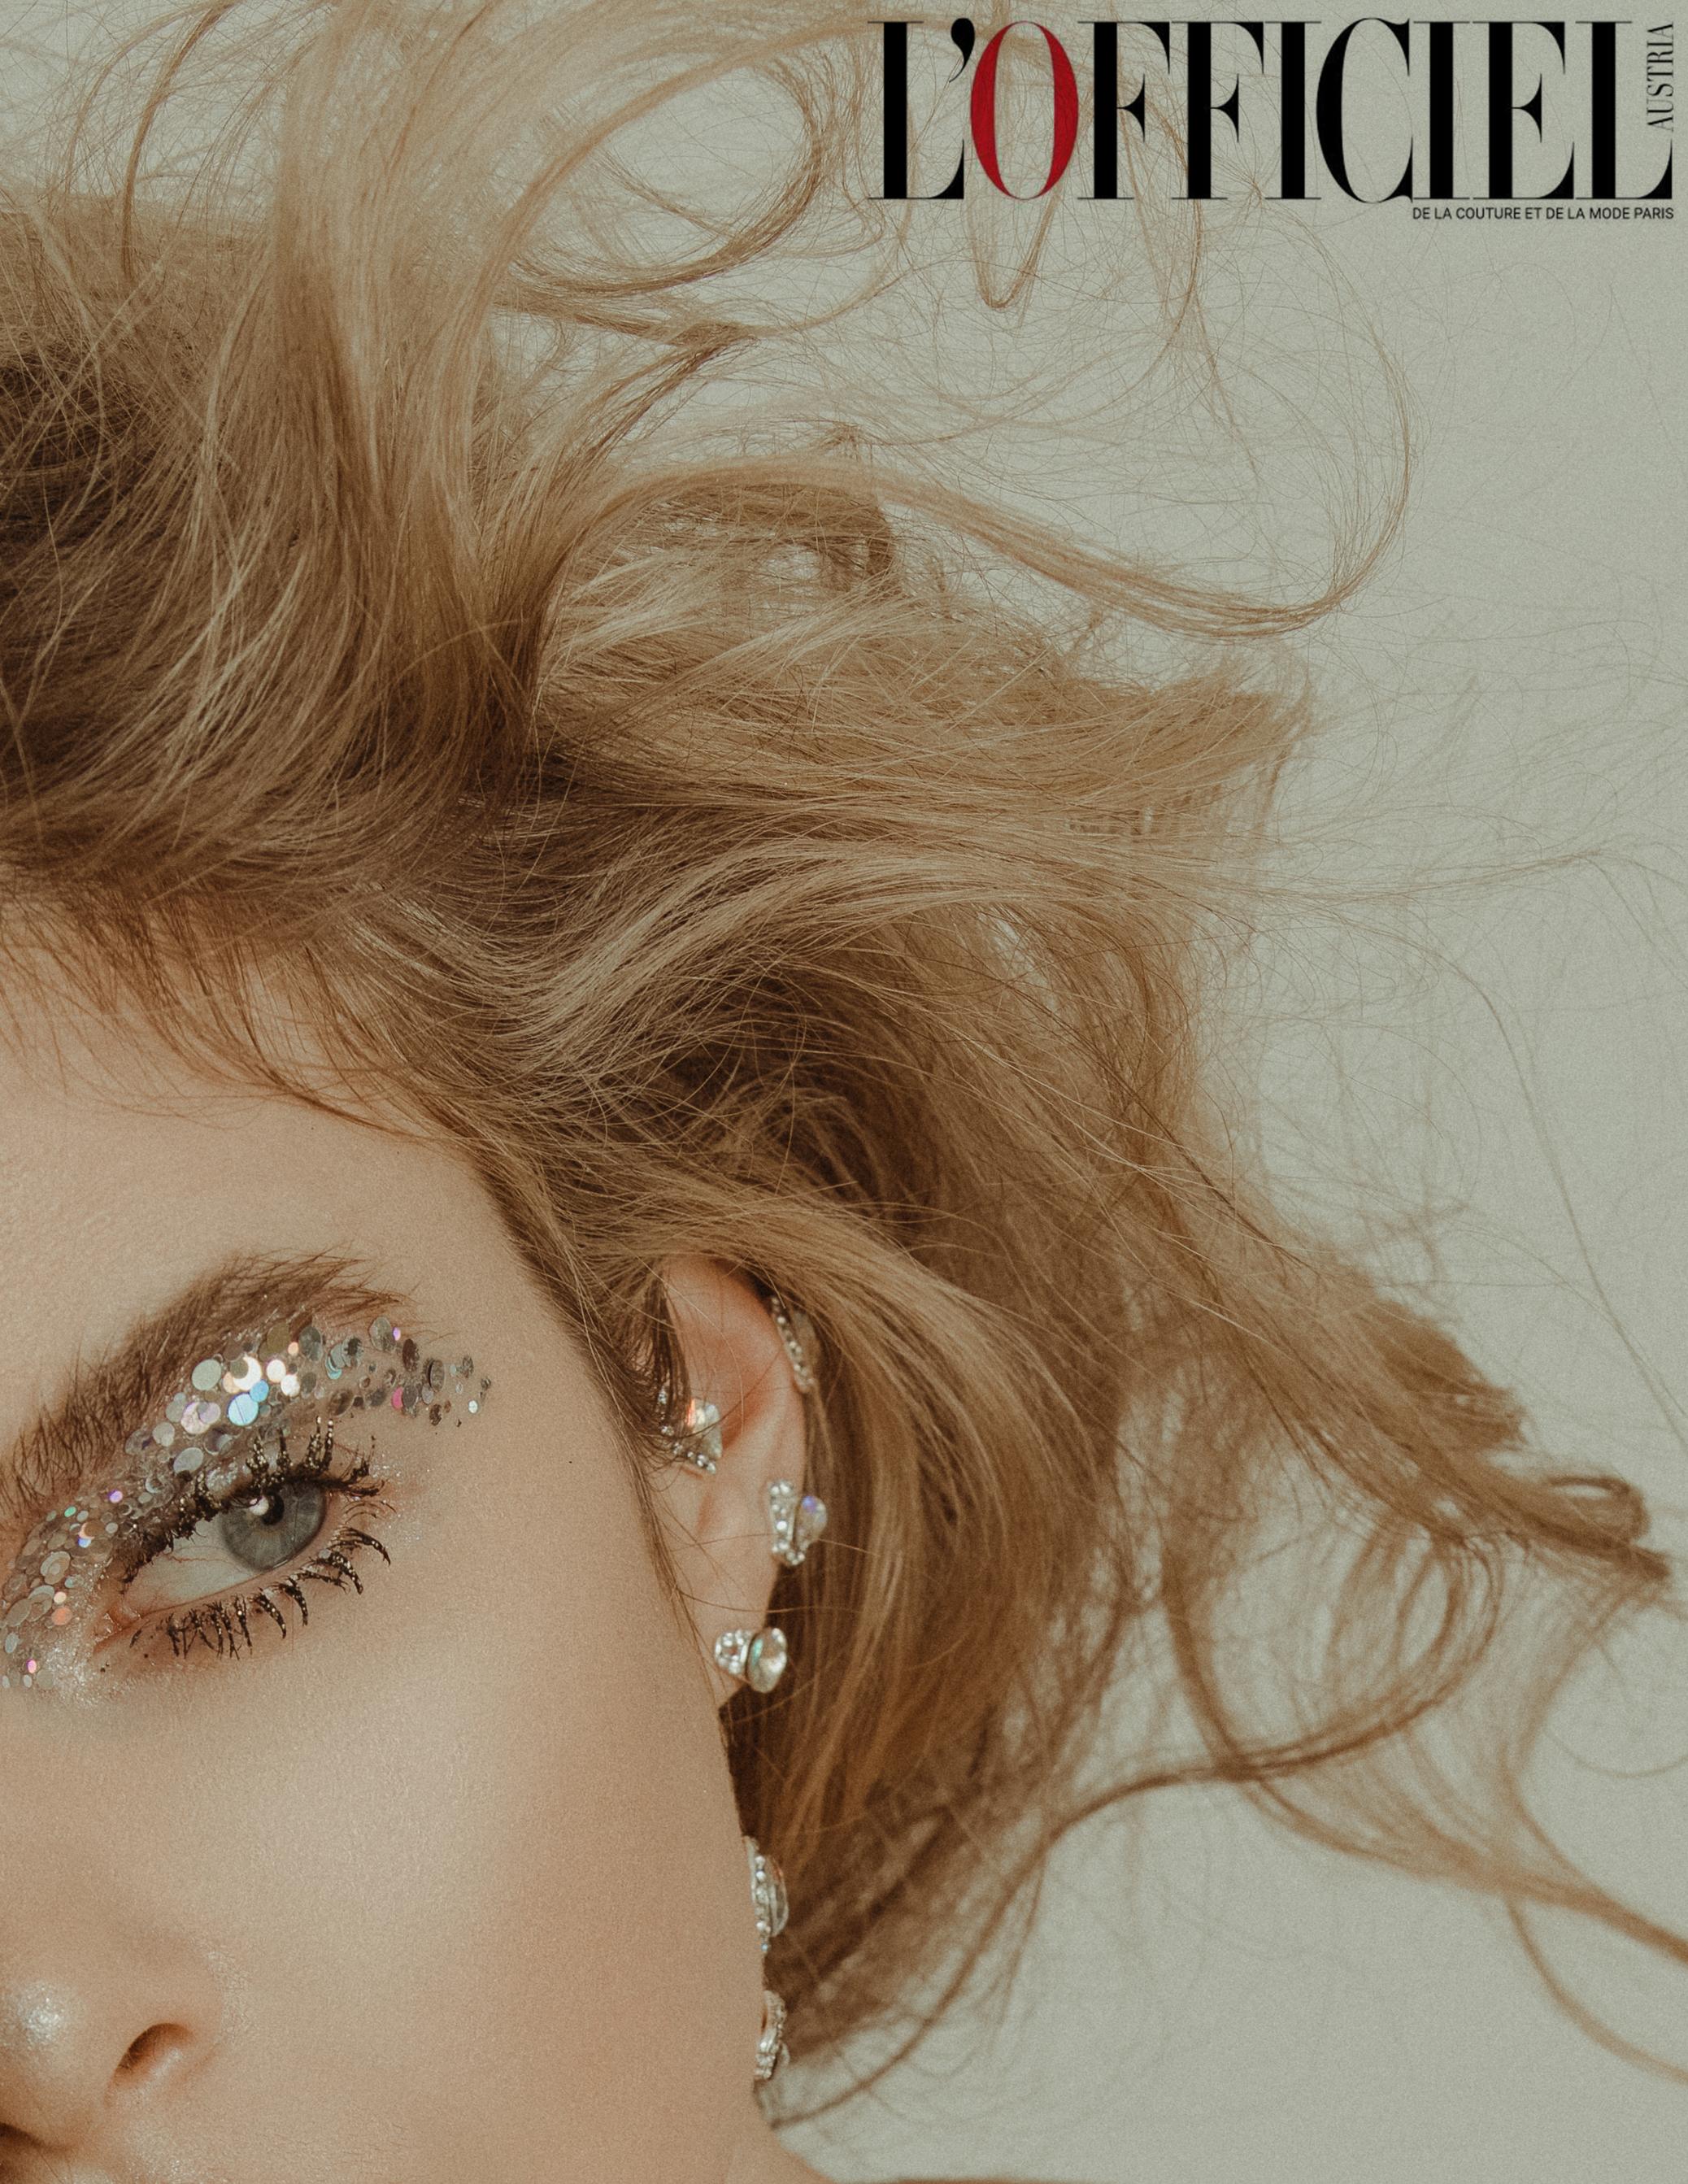 Duo_Linn_Lofficiel_Austria_Beauty_Editorial_02.jpg